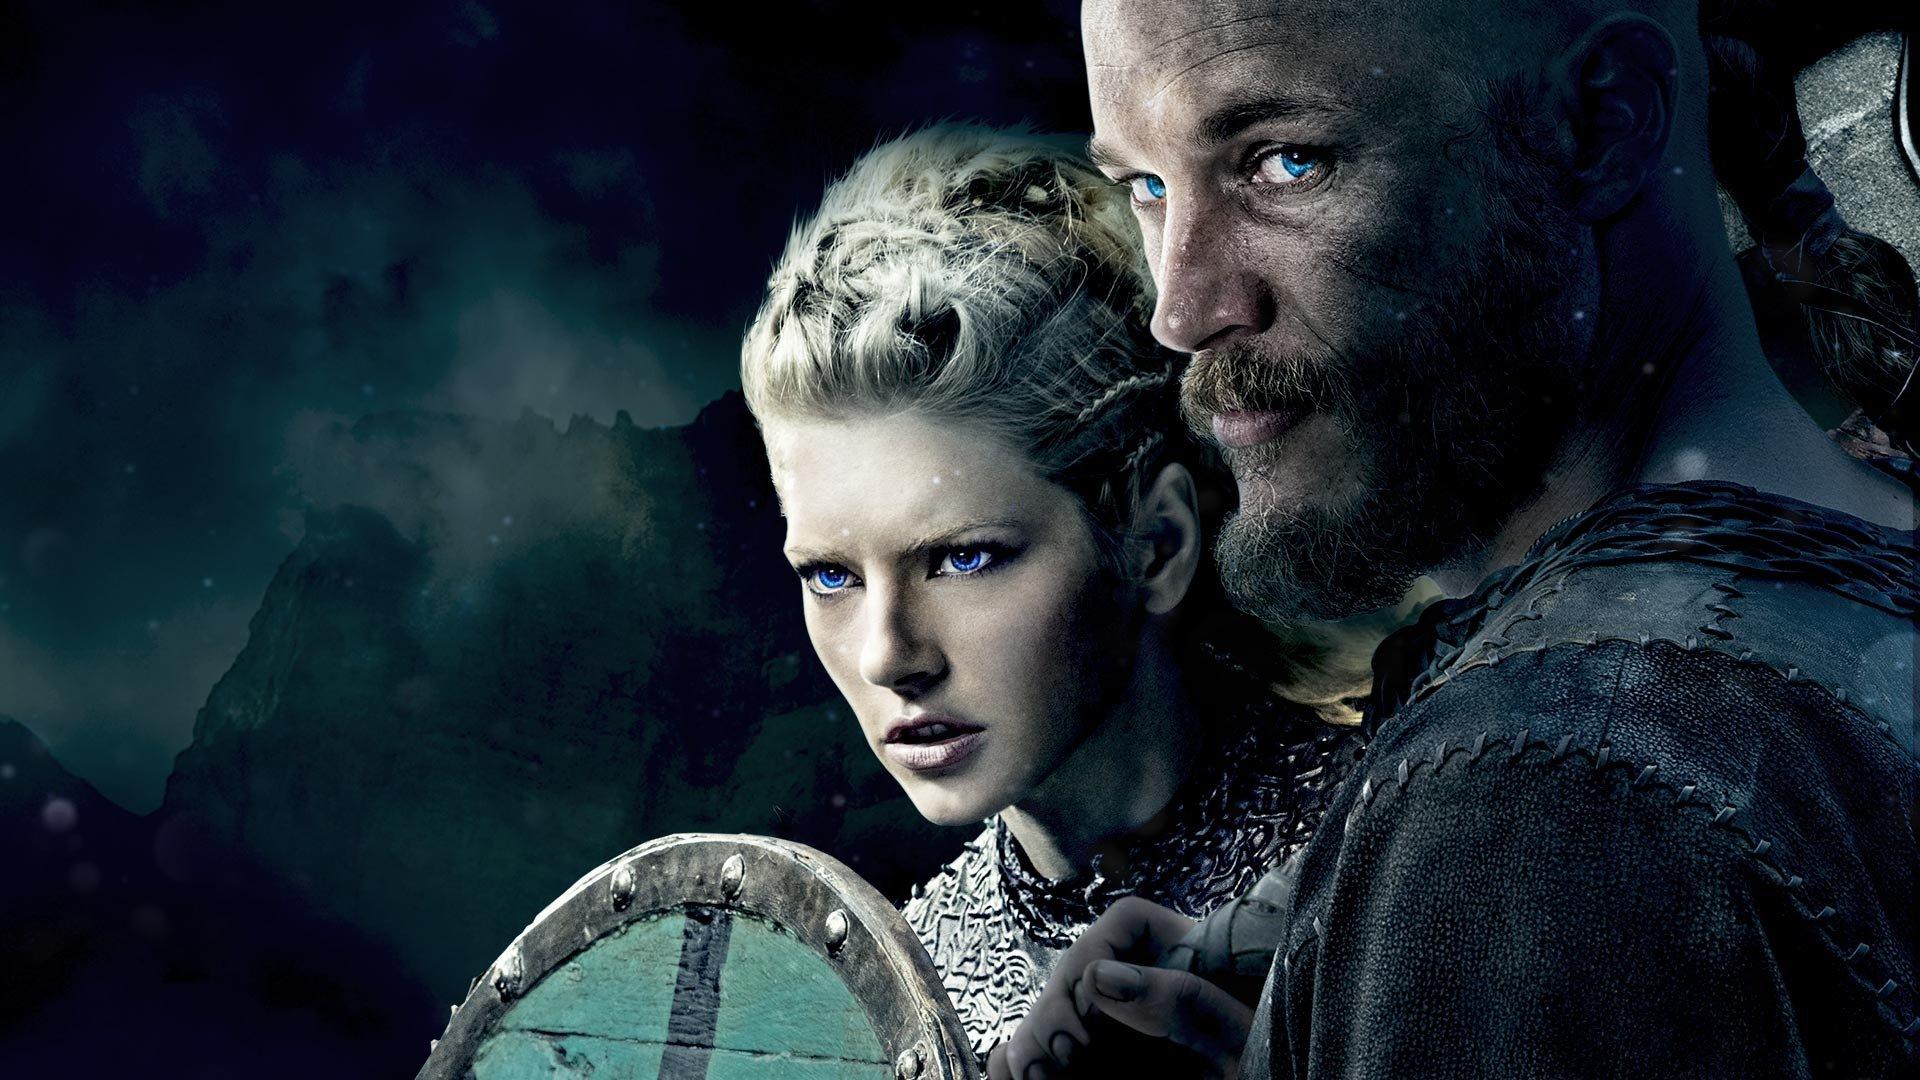 Download full hd 1080p Vikings PC wallpaper ID:346163 for free